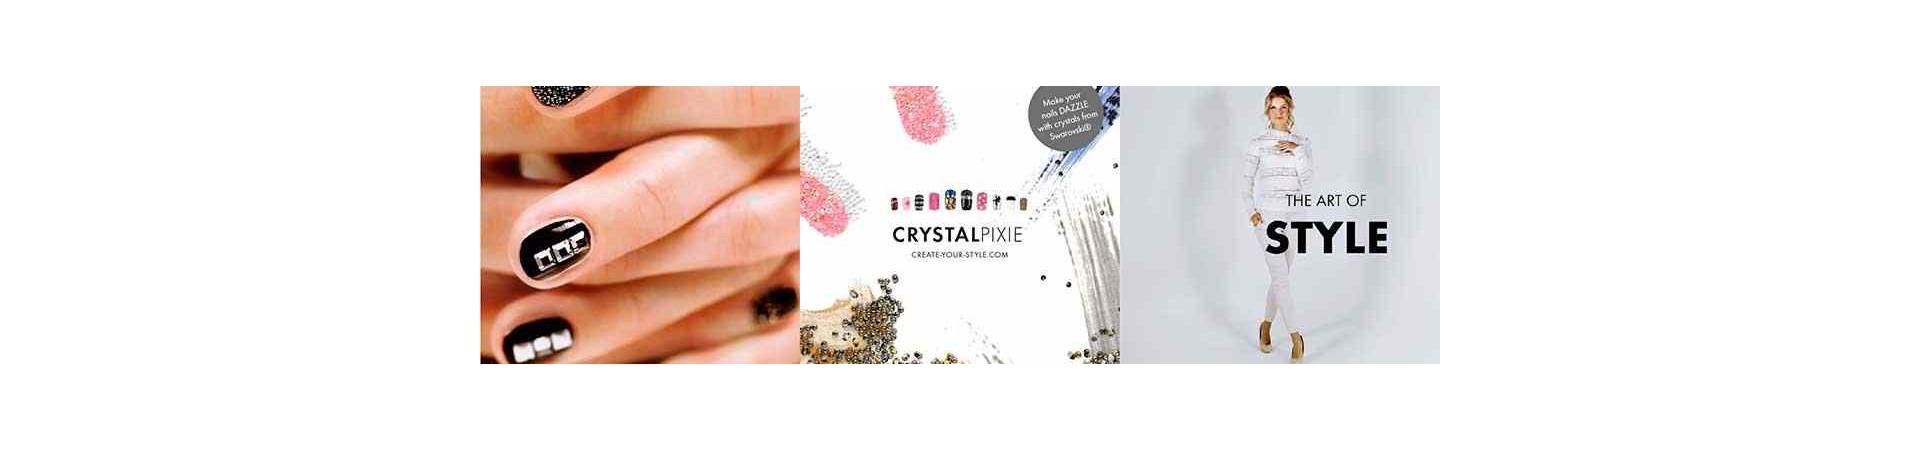 Swarovski Nail Products